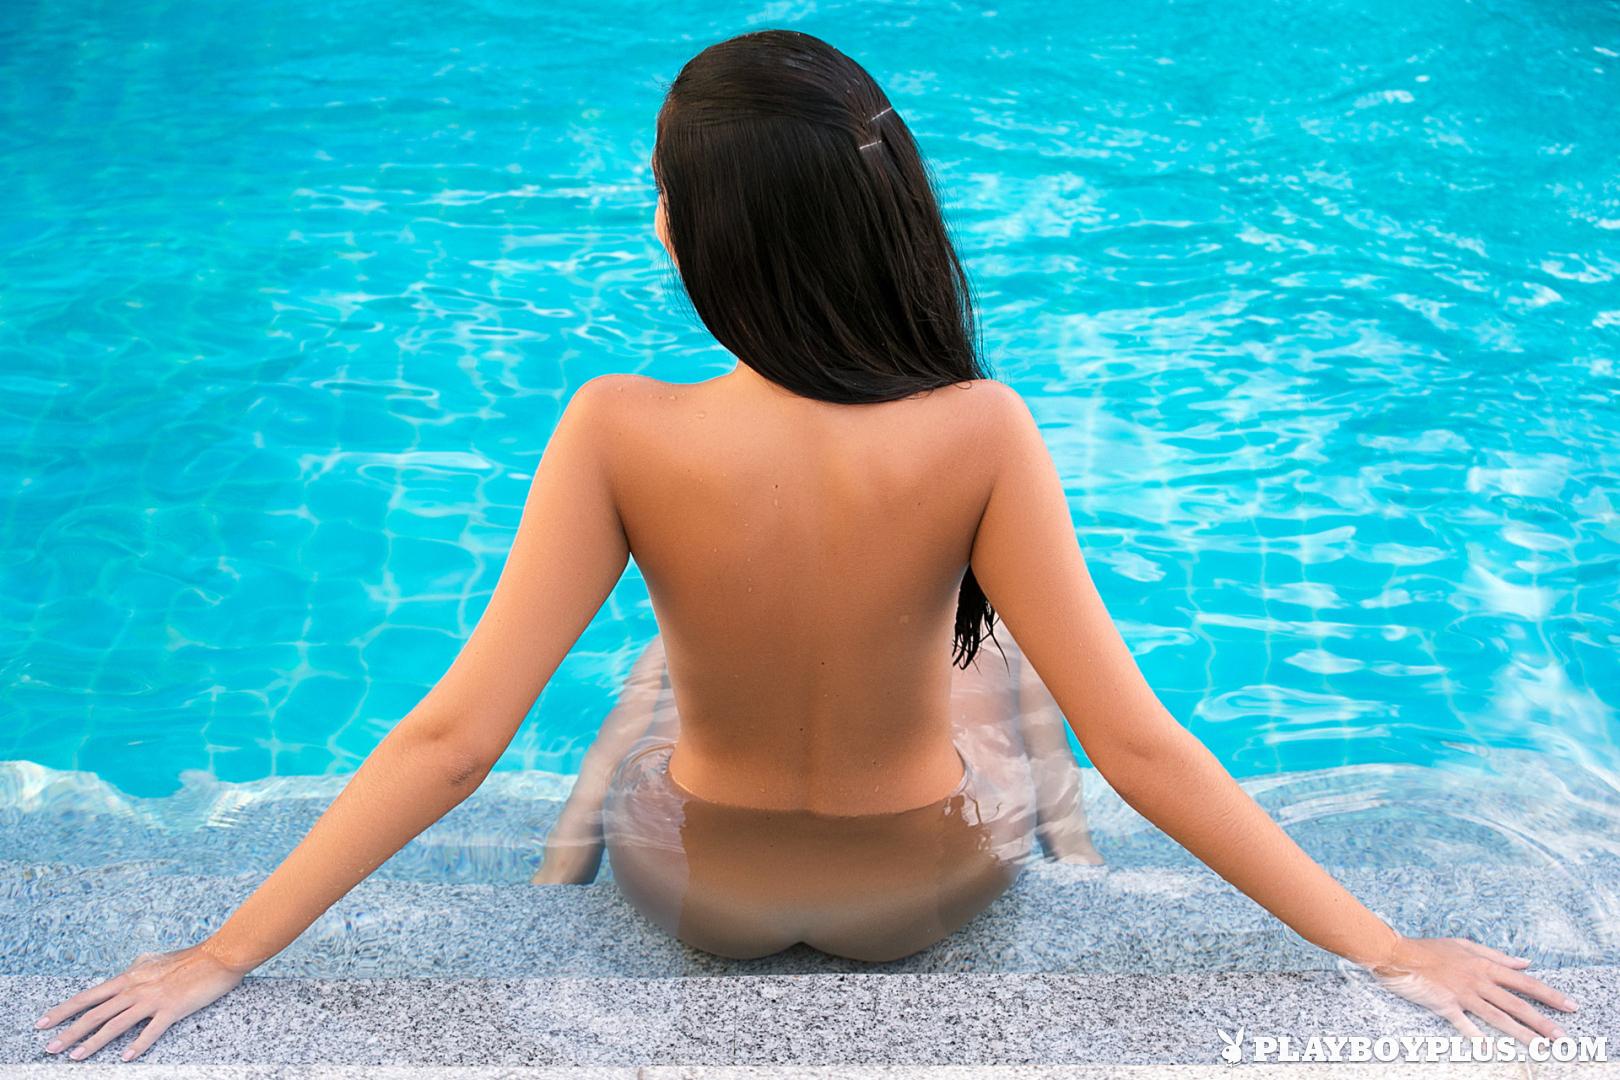 Playboy Cybergirl - Pamela Anne Gordon Nude Photos & Videos at Playboy Plus!